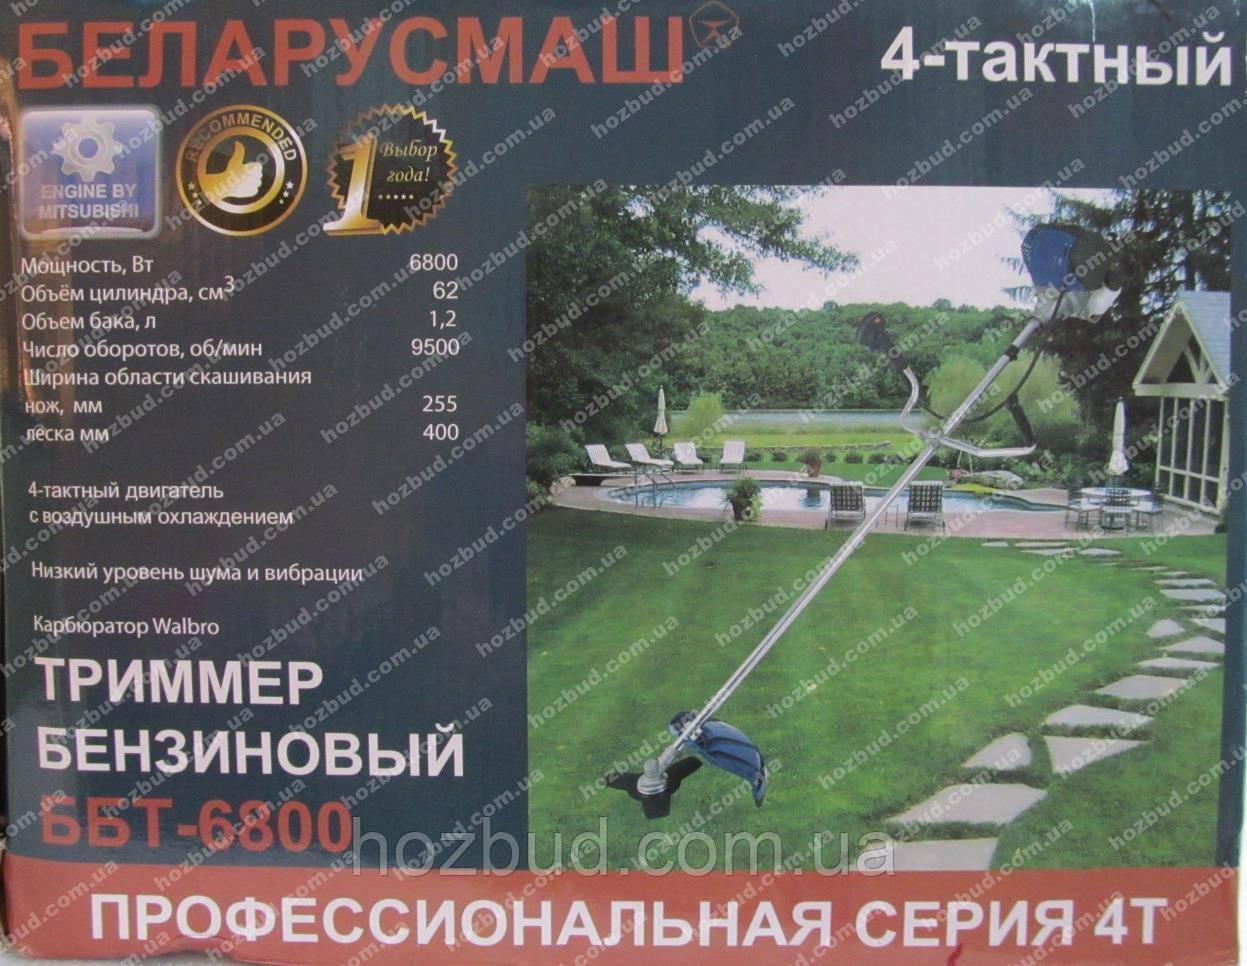 Бензокоса Беларусмаш ББТ-6800